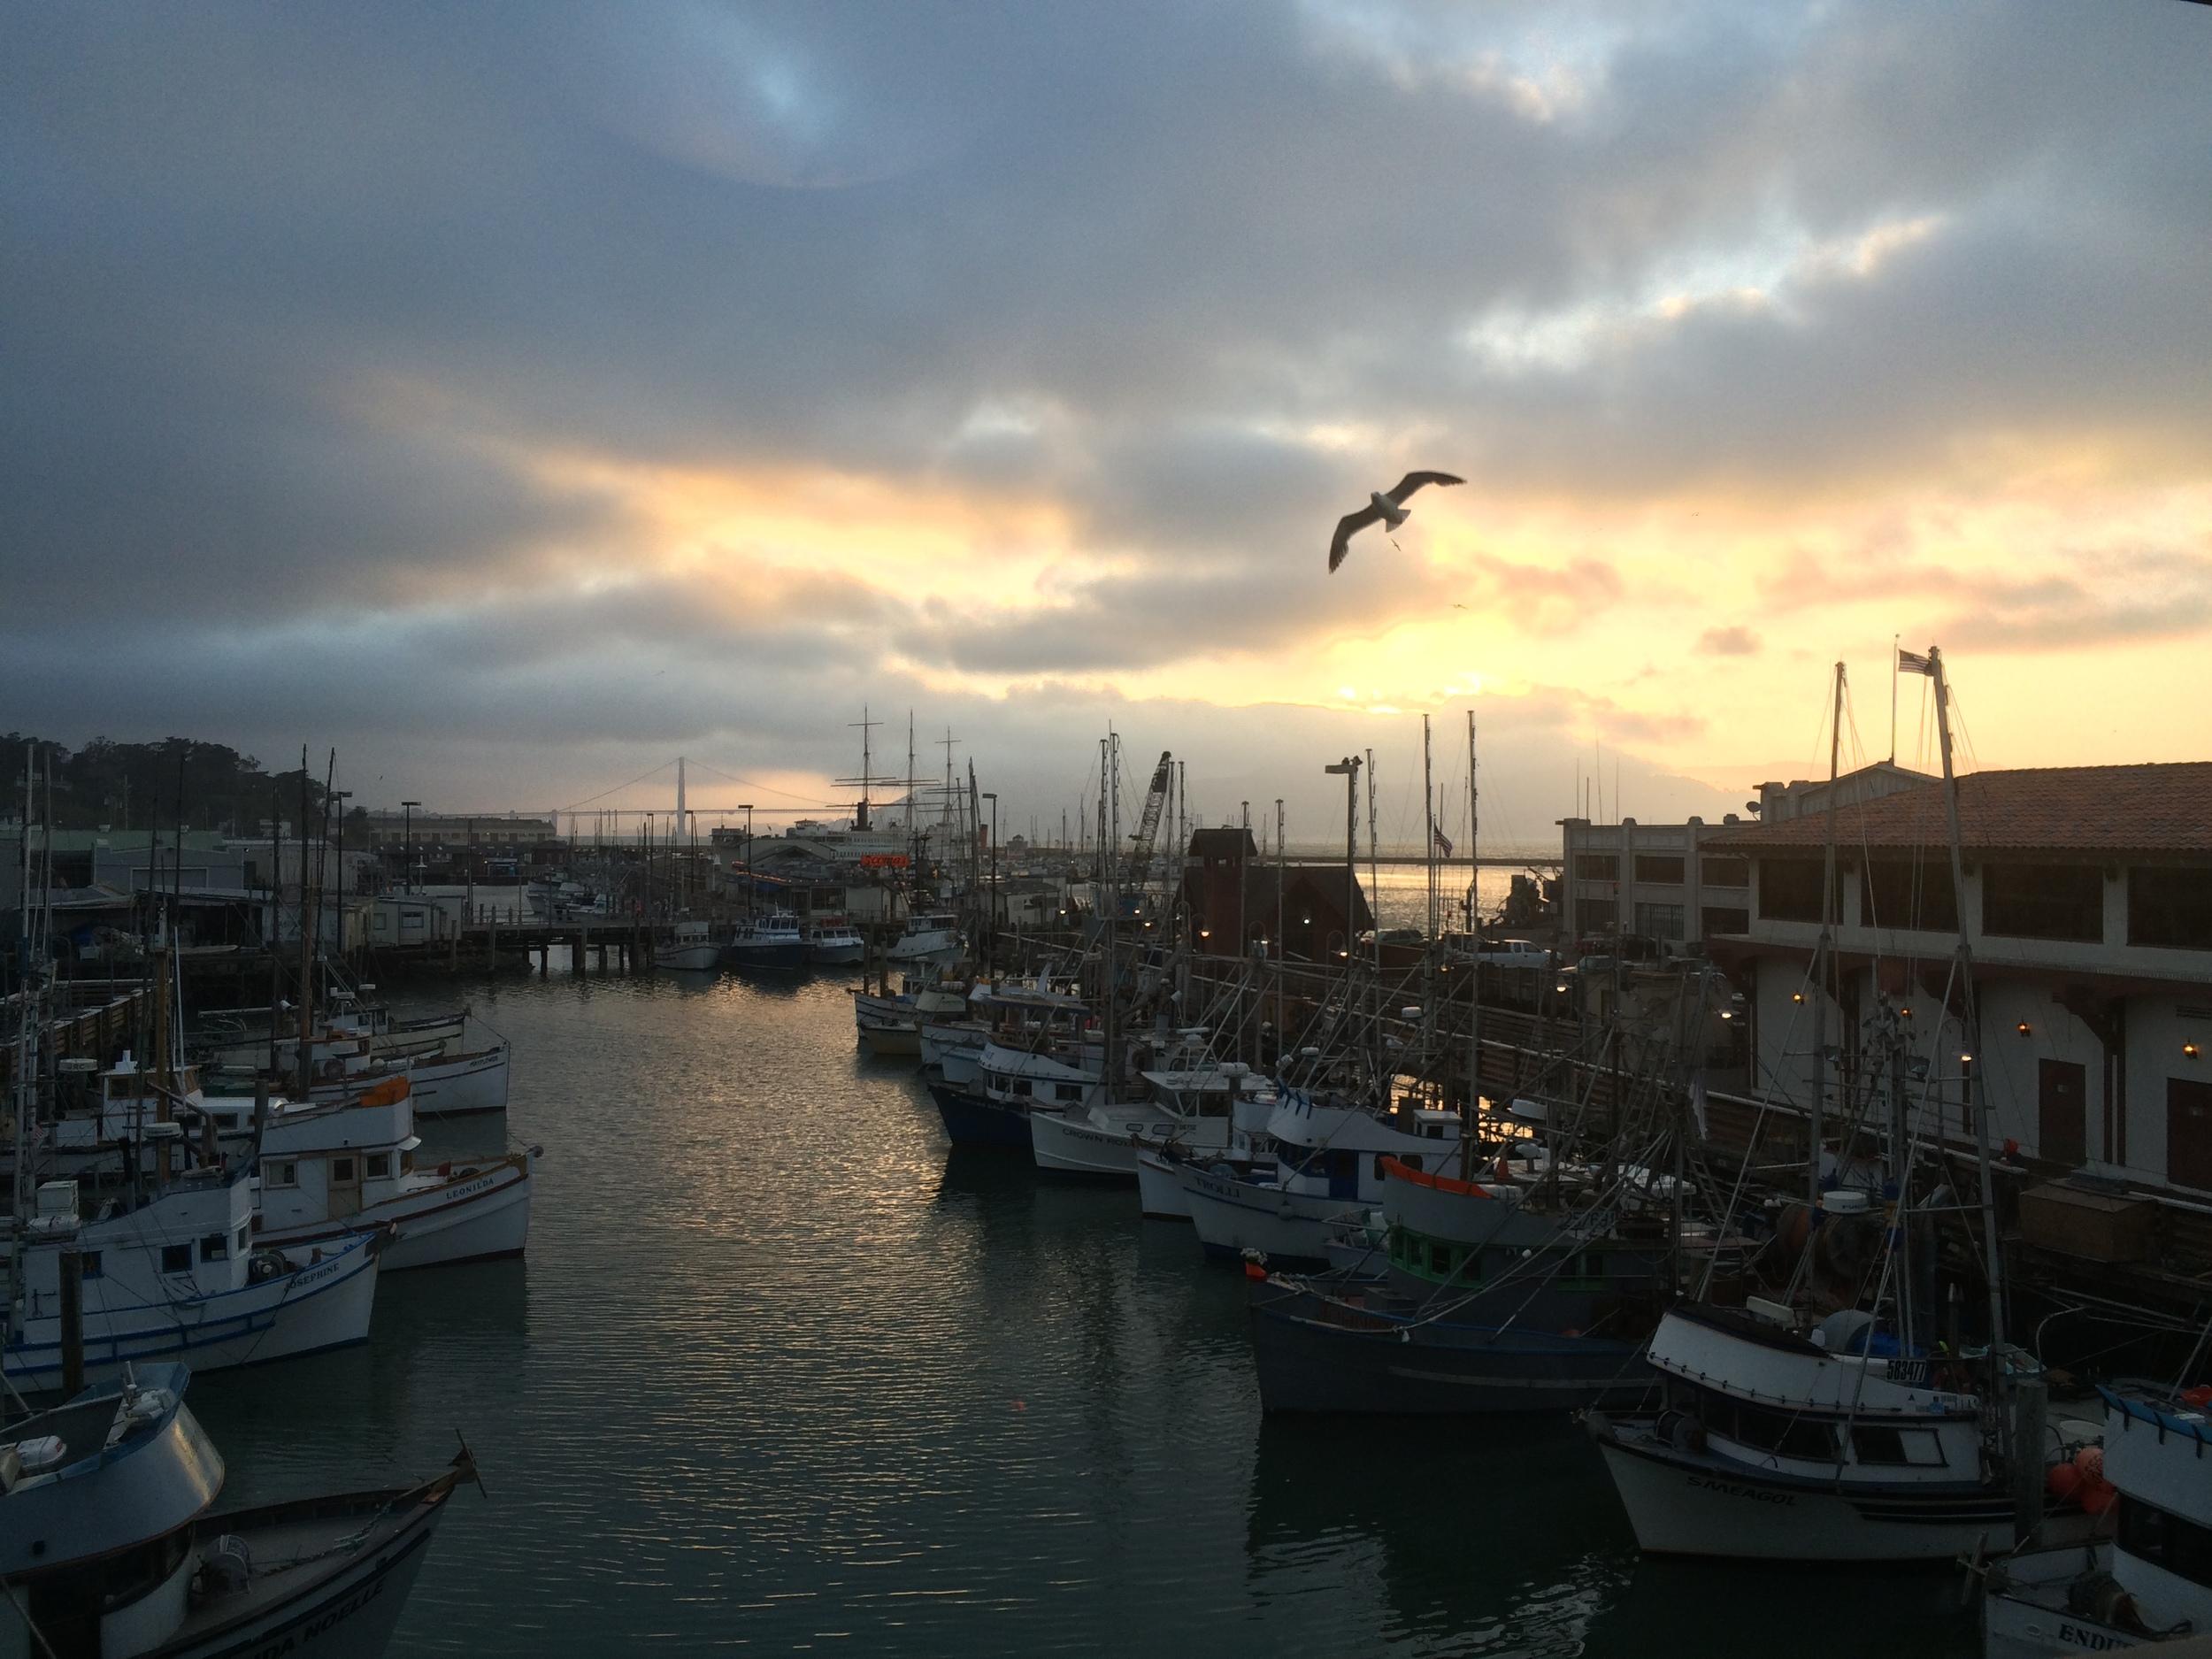 San Francisco, Fisherman's Wharf Marina Sunset, June 2015